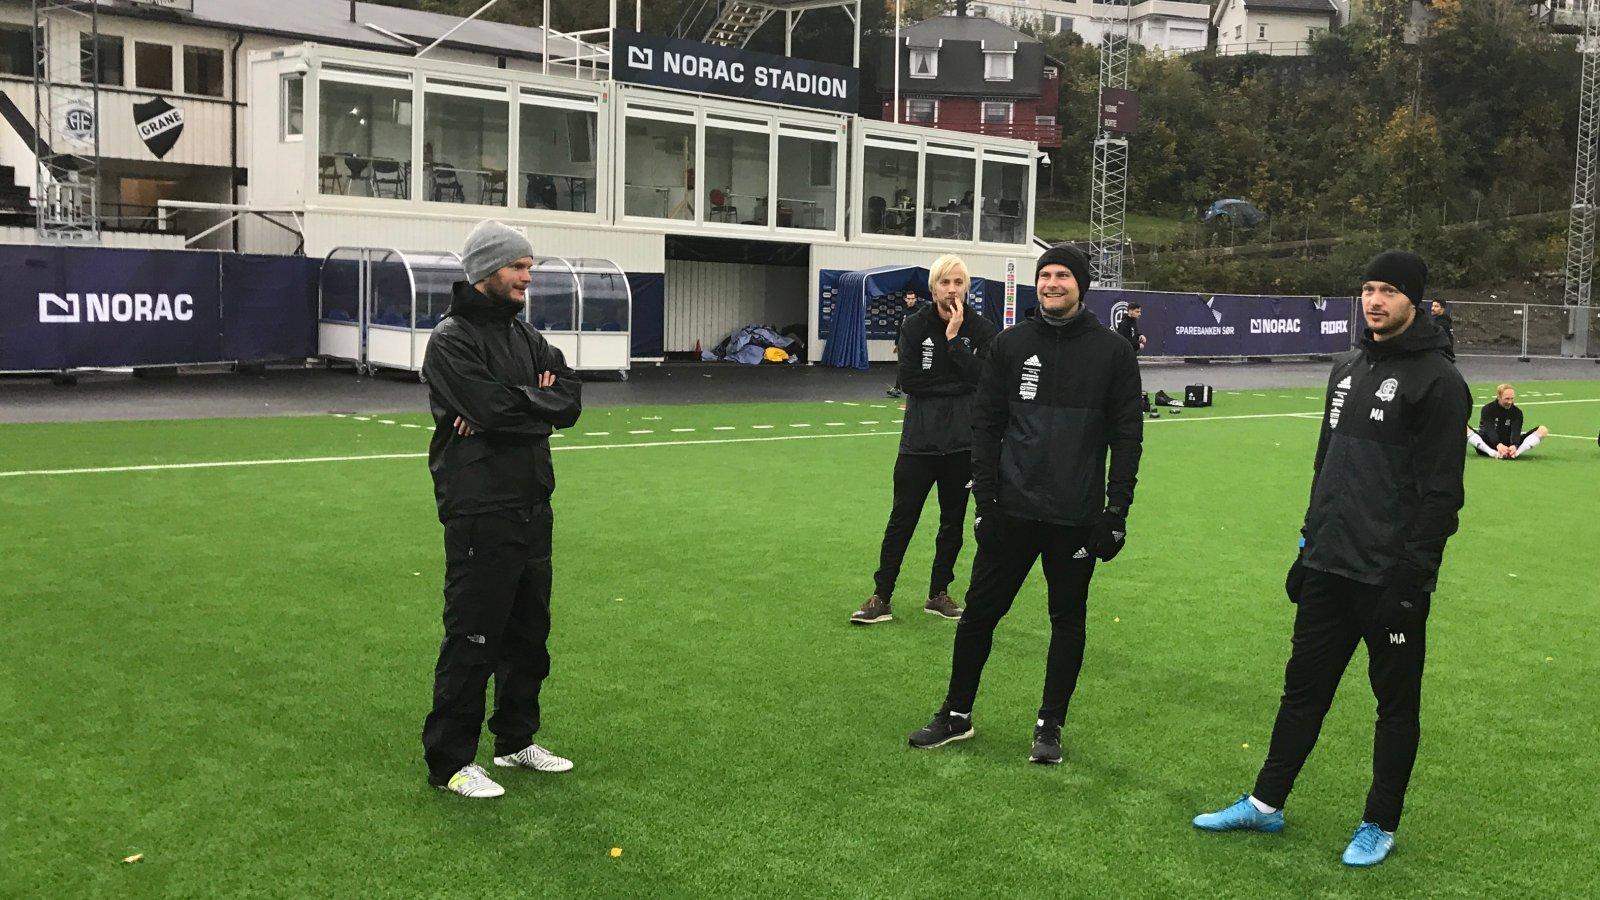 Assistenttrener Øyvind Dalseth, koordinator Thomas Seland, manuellterapeut Torbjørn Selås og trener Mattias Andersson på Norac stadion i september 2017.